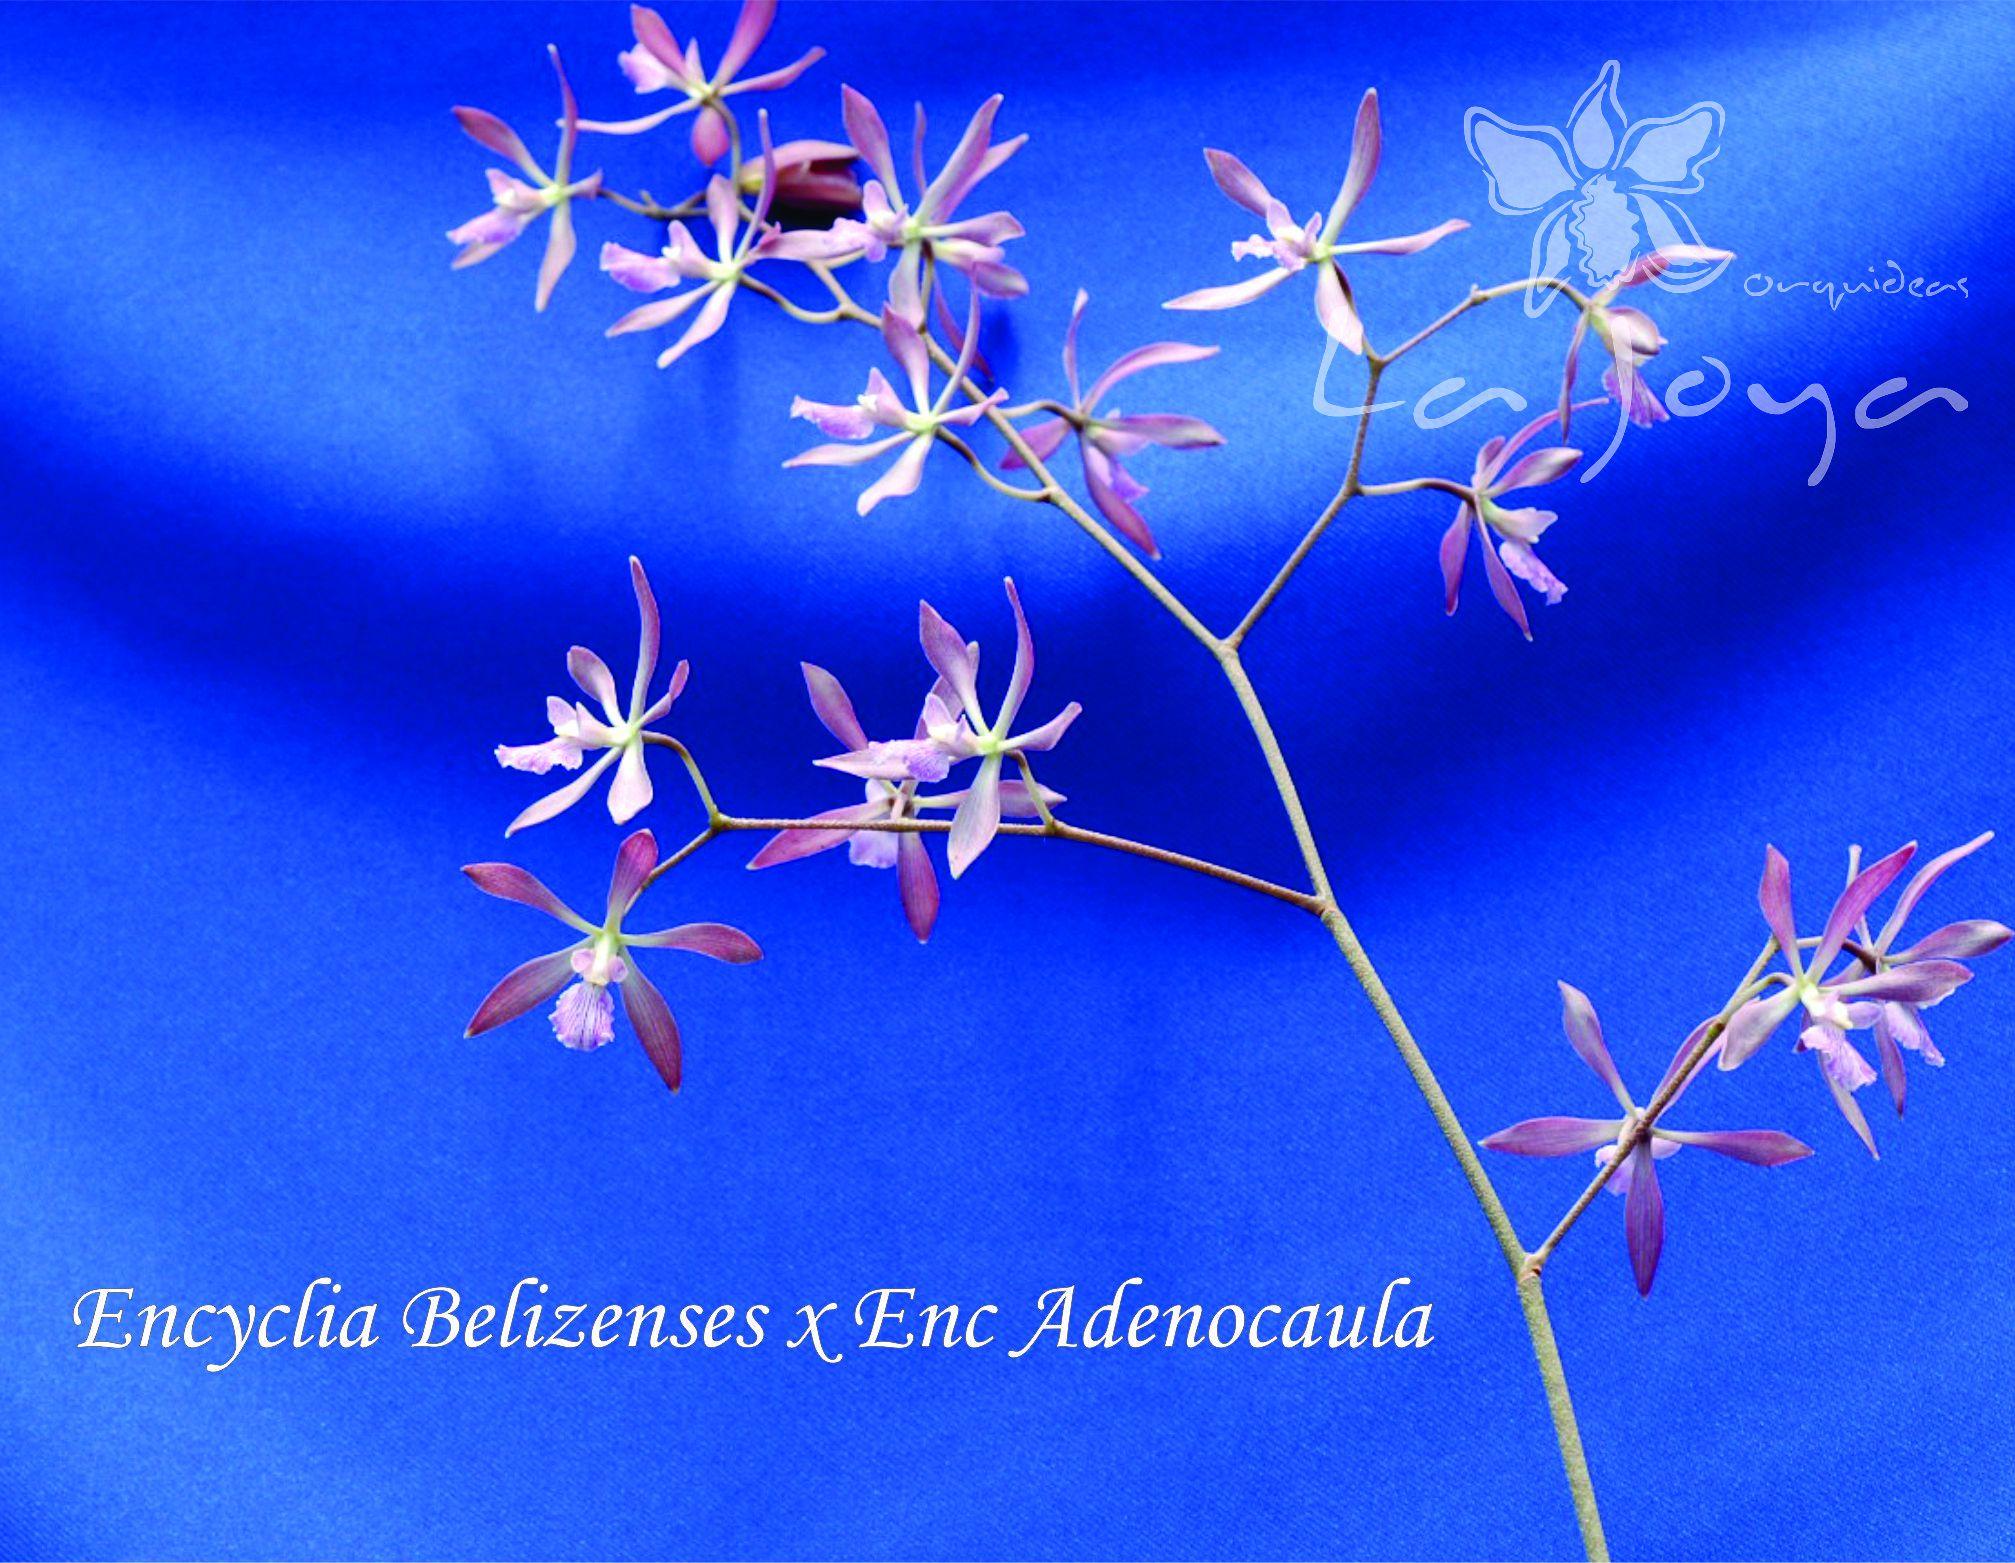 Enc. Belizenzes x Enc. Adenocaula